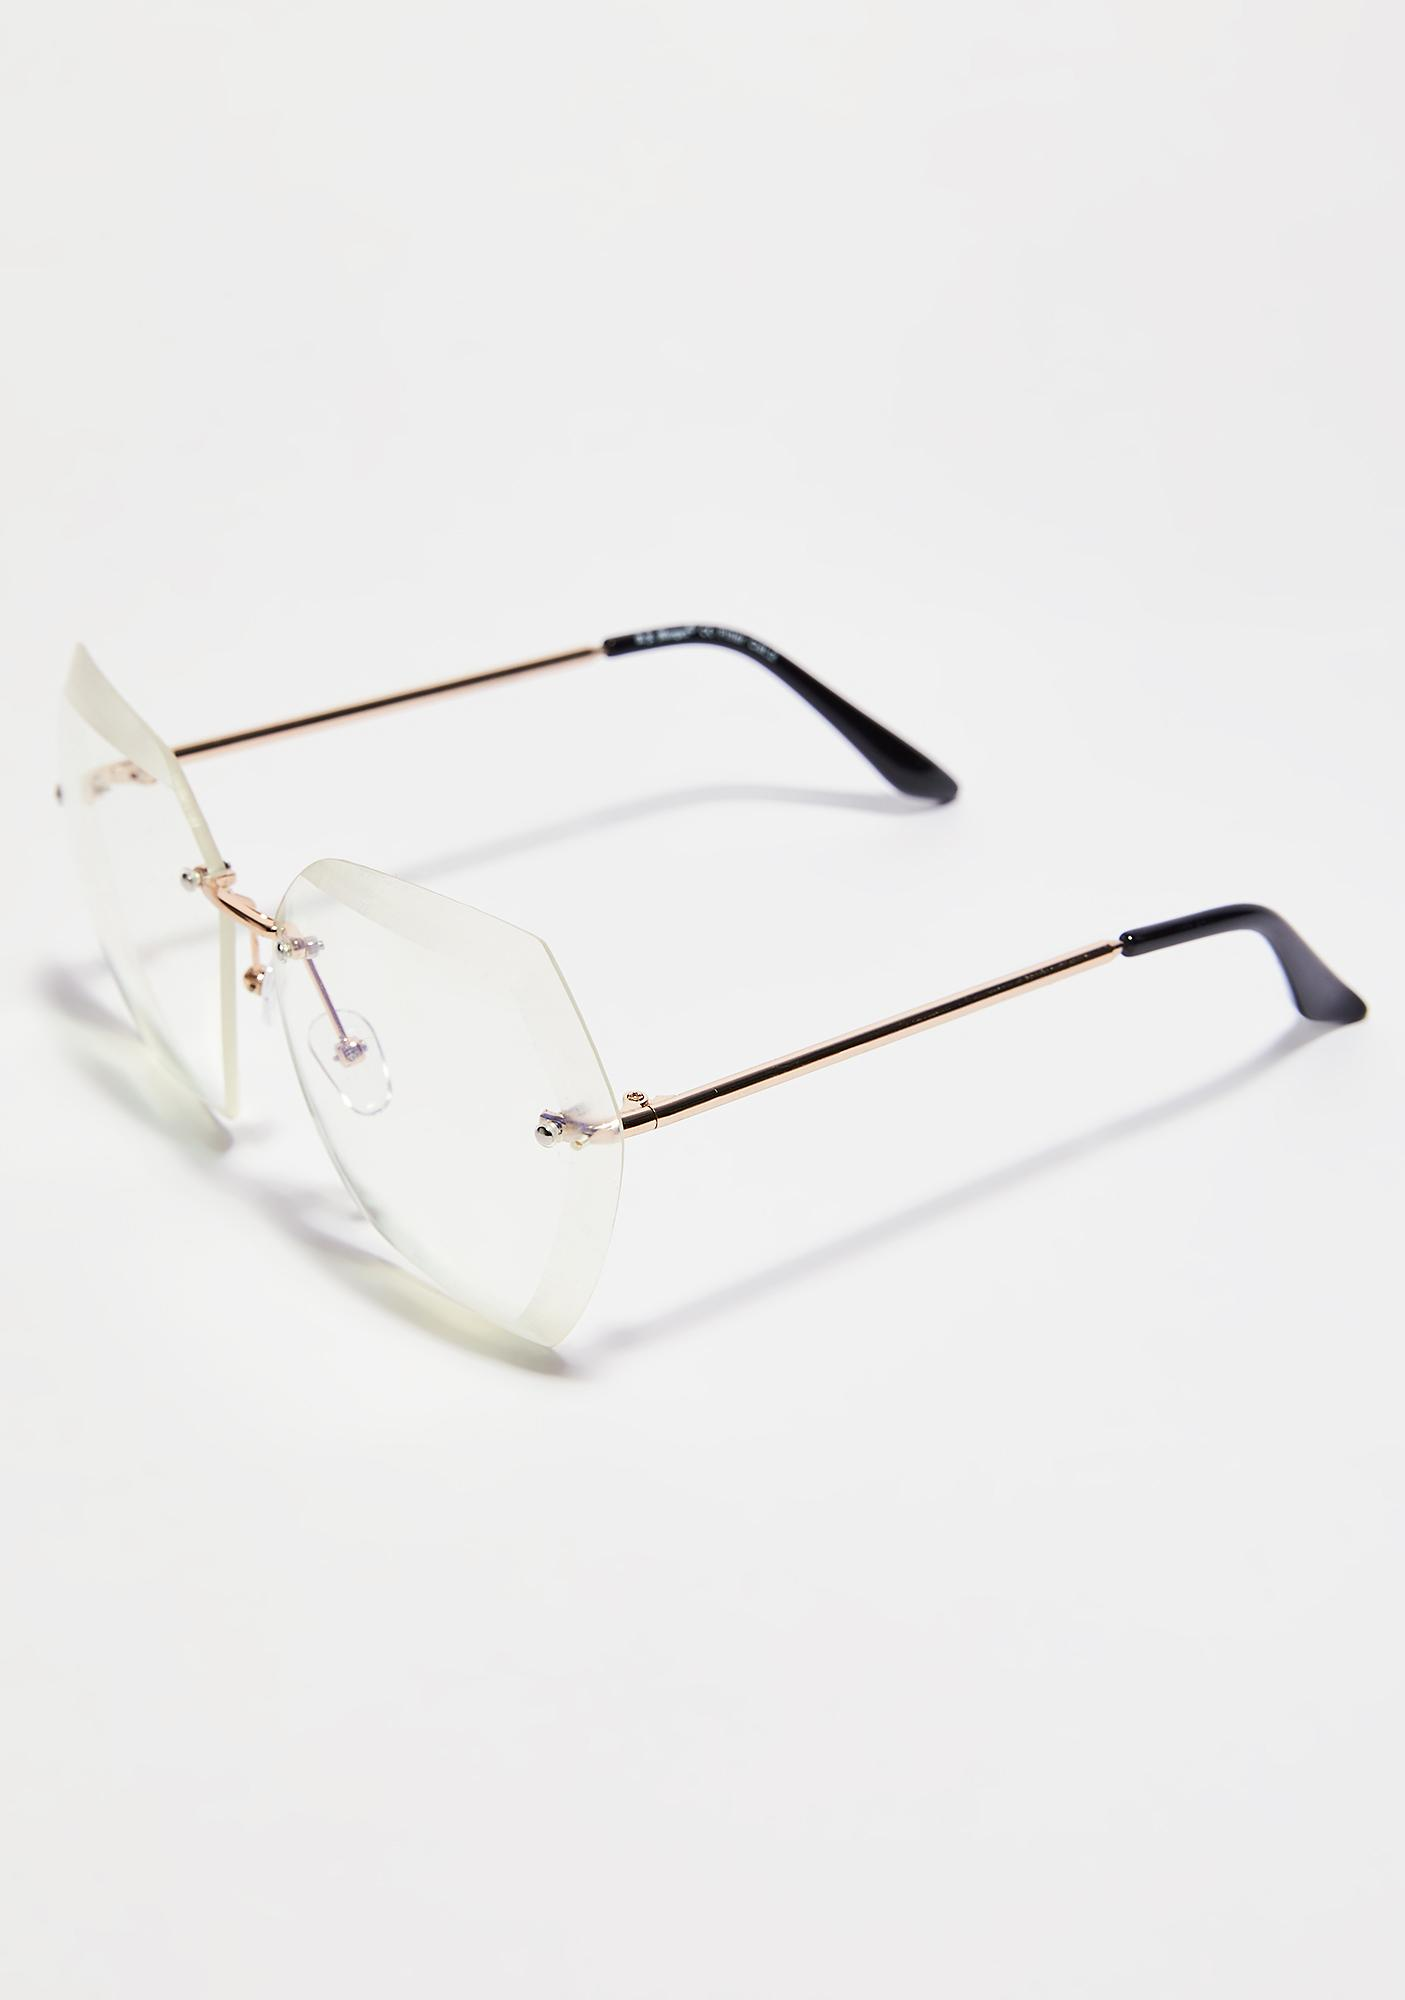 Visualize Me Sunglasses